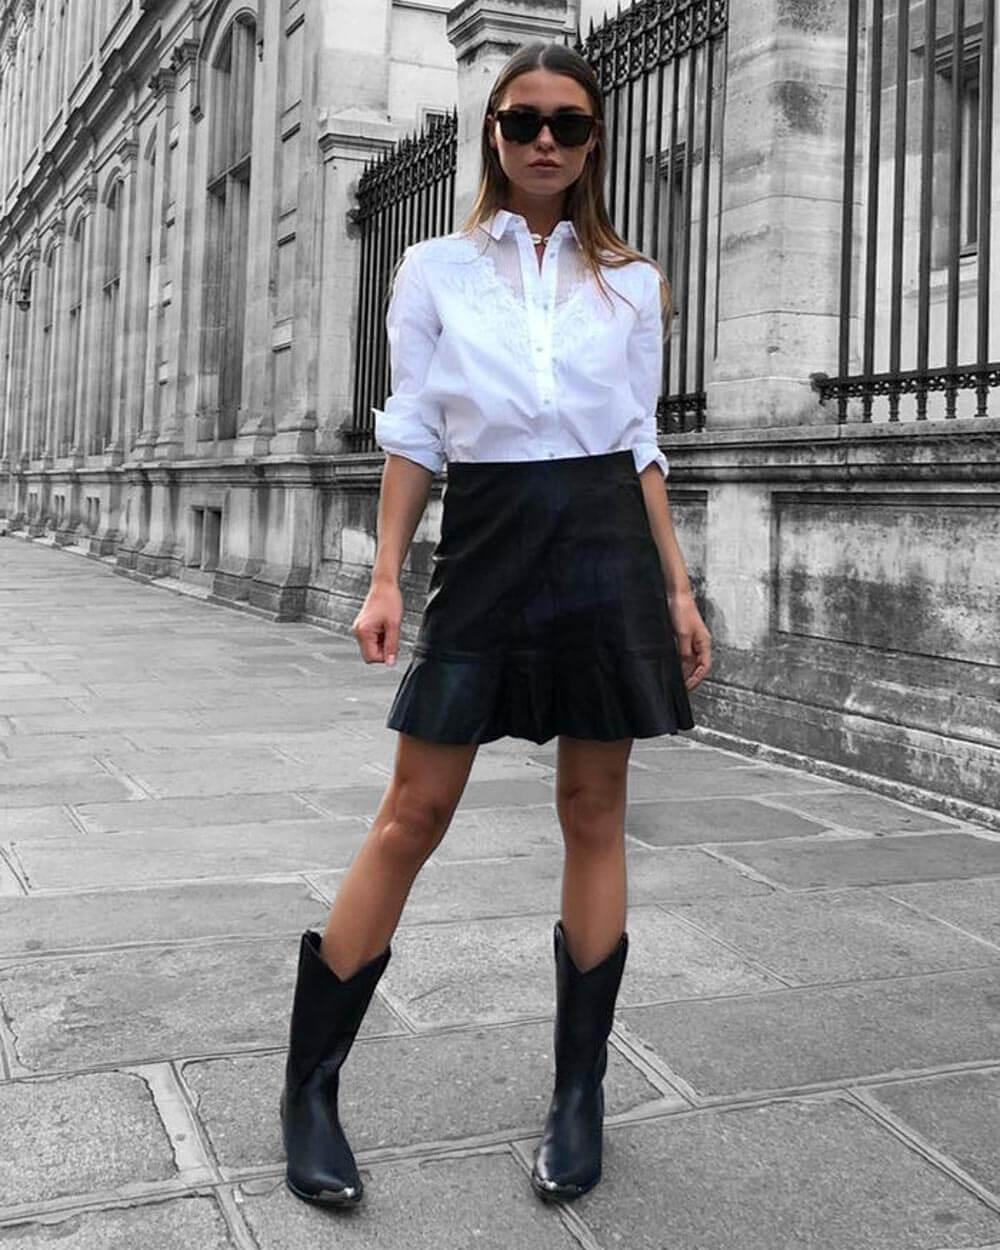 Monochrome Matrix fashion trends of 2021